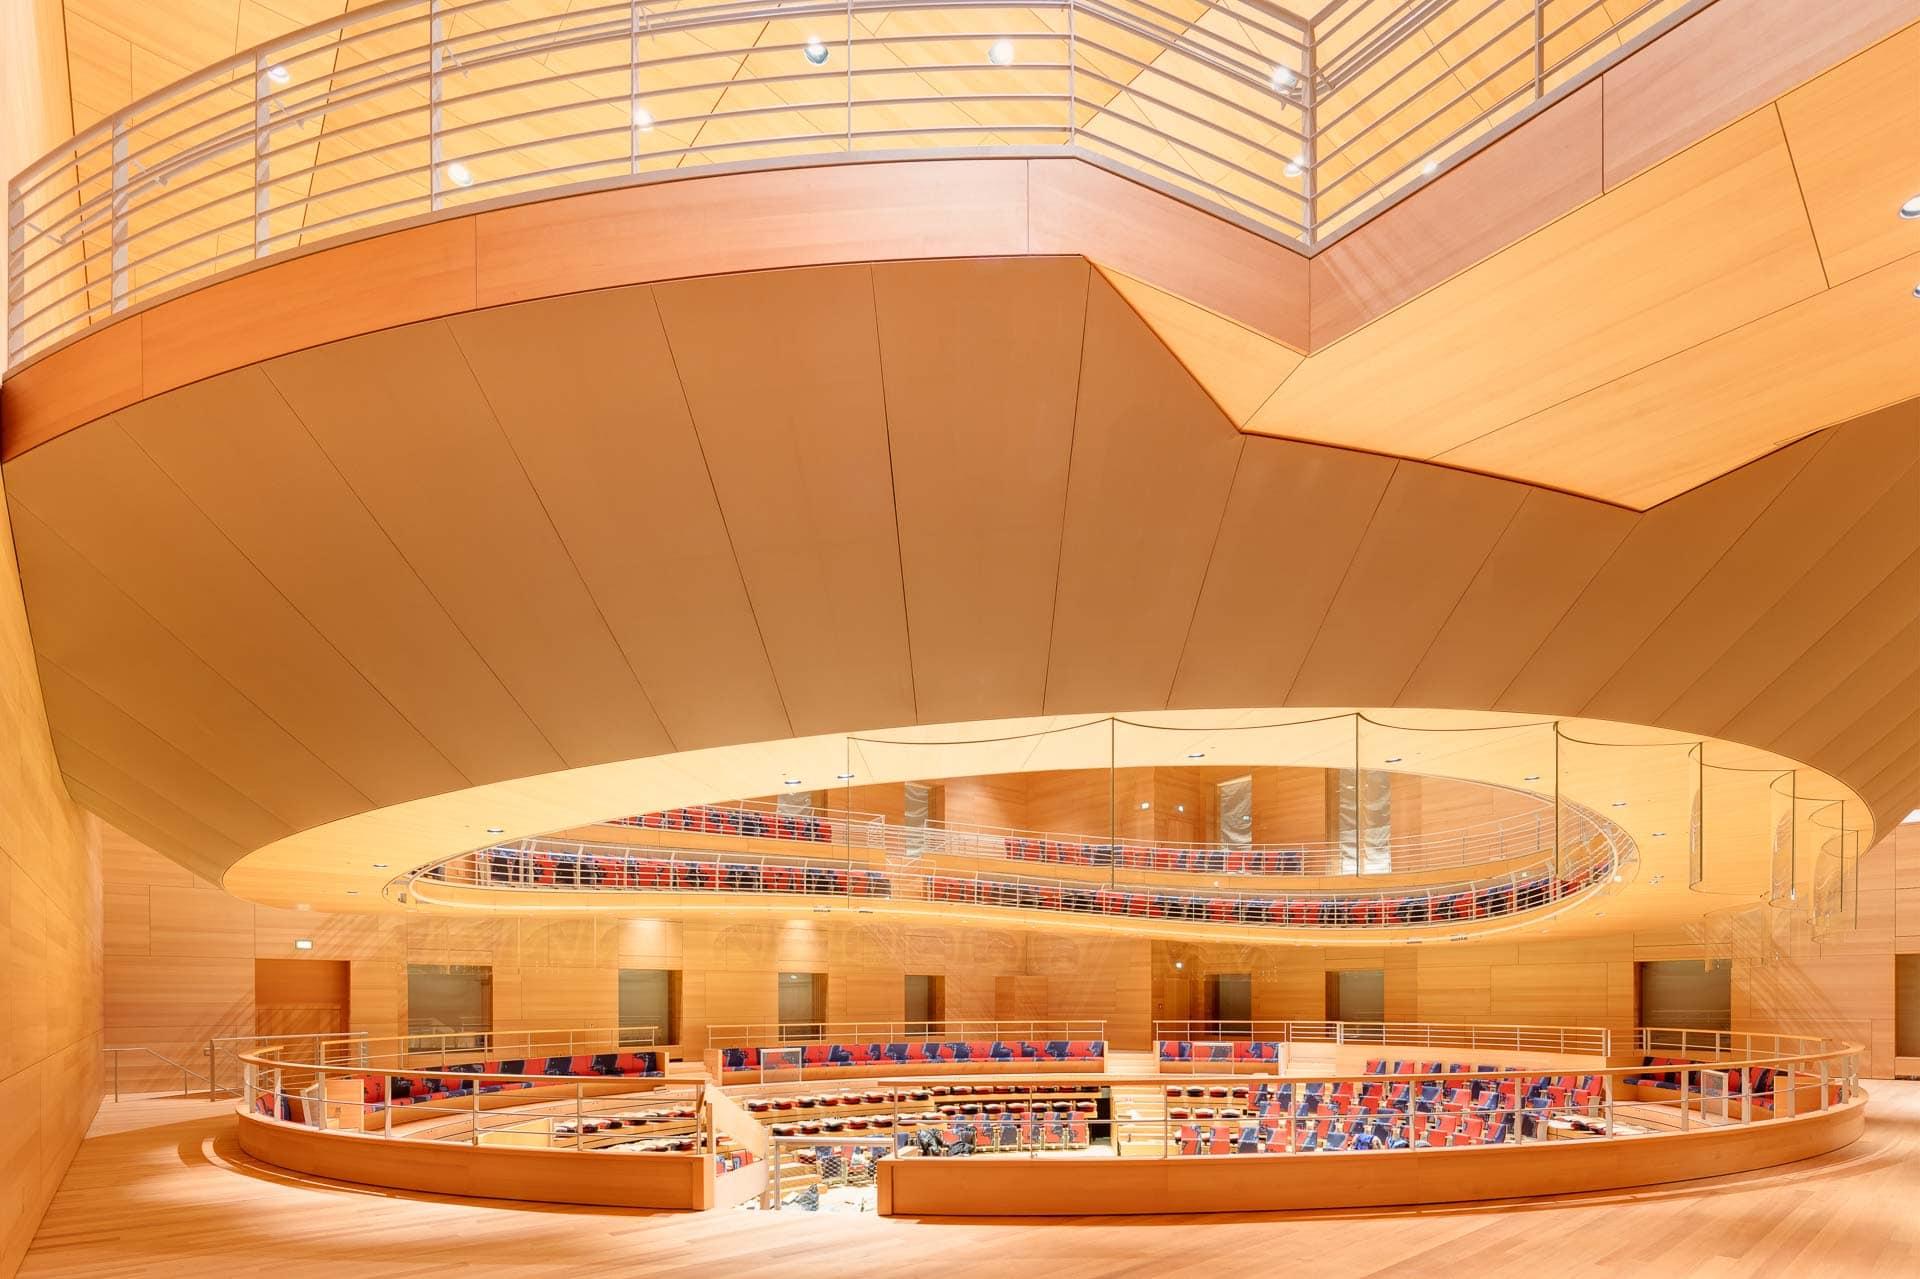 Barenboim-Said-Akademie, Pierre-Boulez-Saal, Frank Gehry